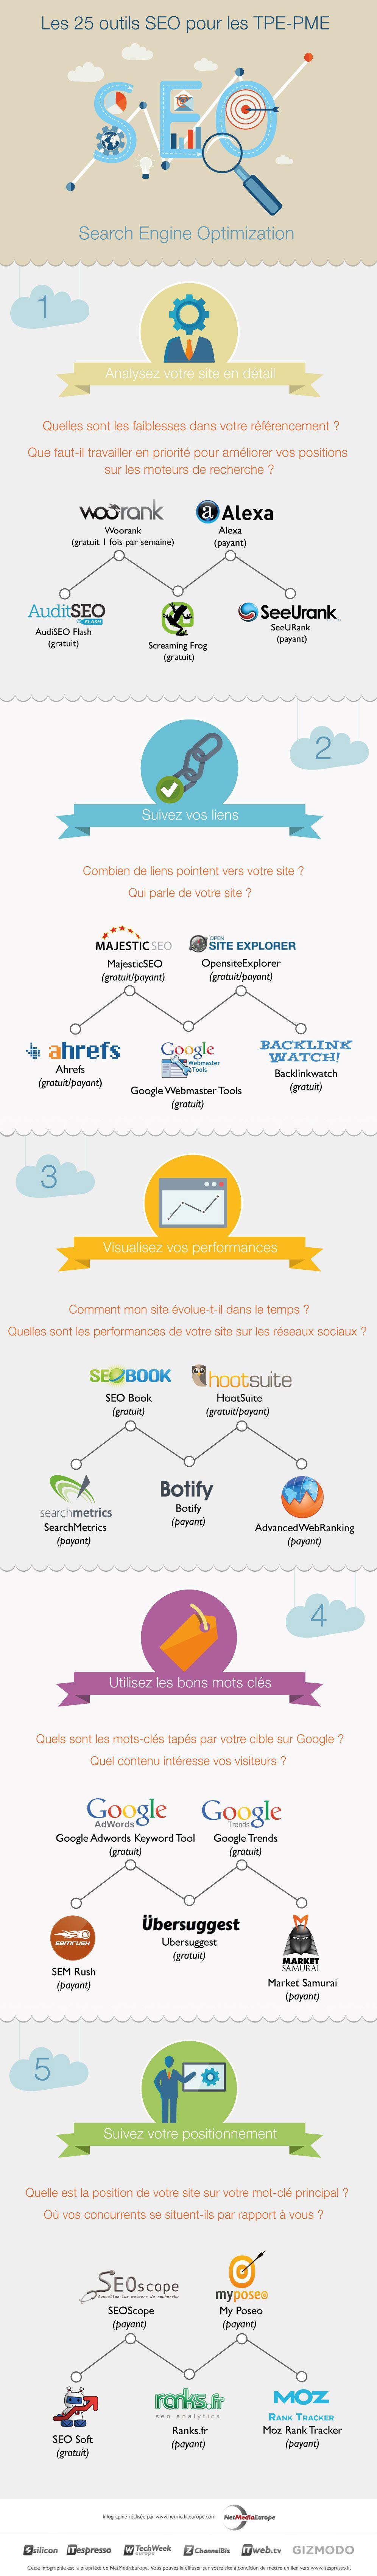 25 outils SEO en infographie